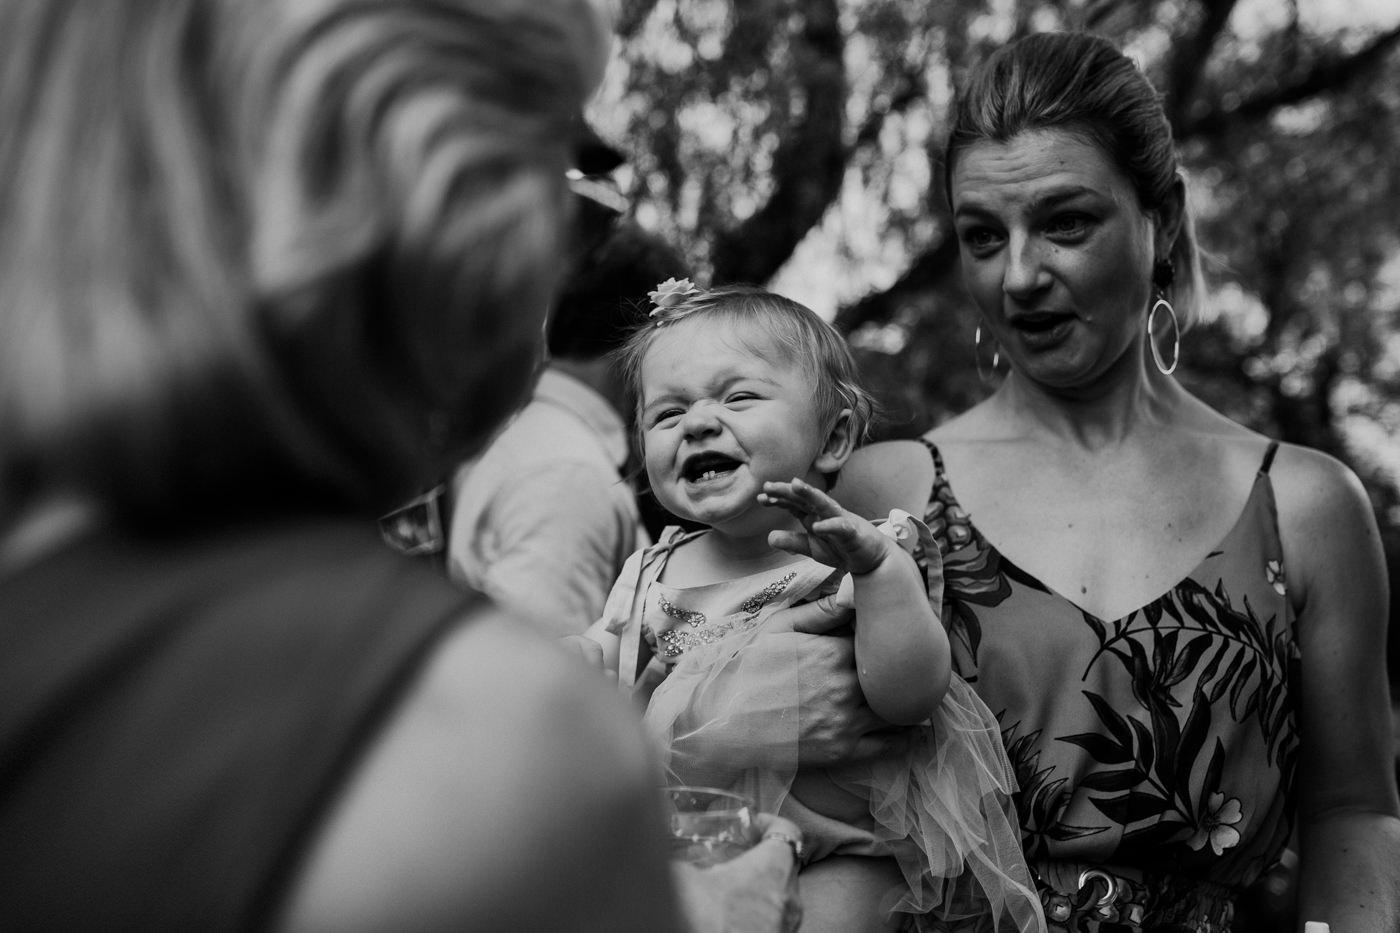 Anthony & Eliet - Wagga Wagga Wedding - Country NSW - Samantha Heather Photography-117.jpg